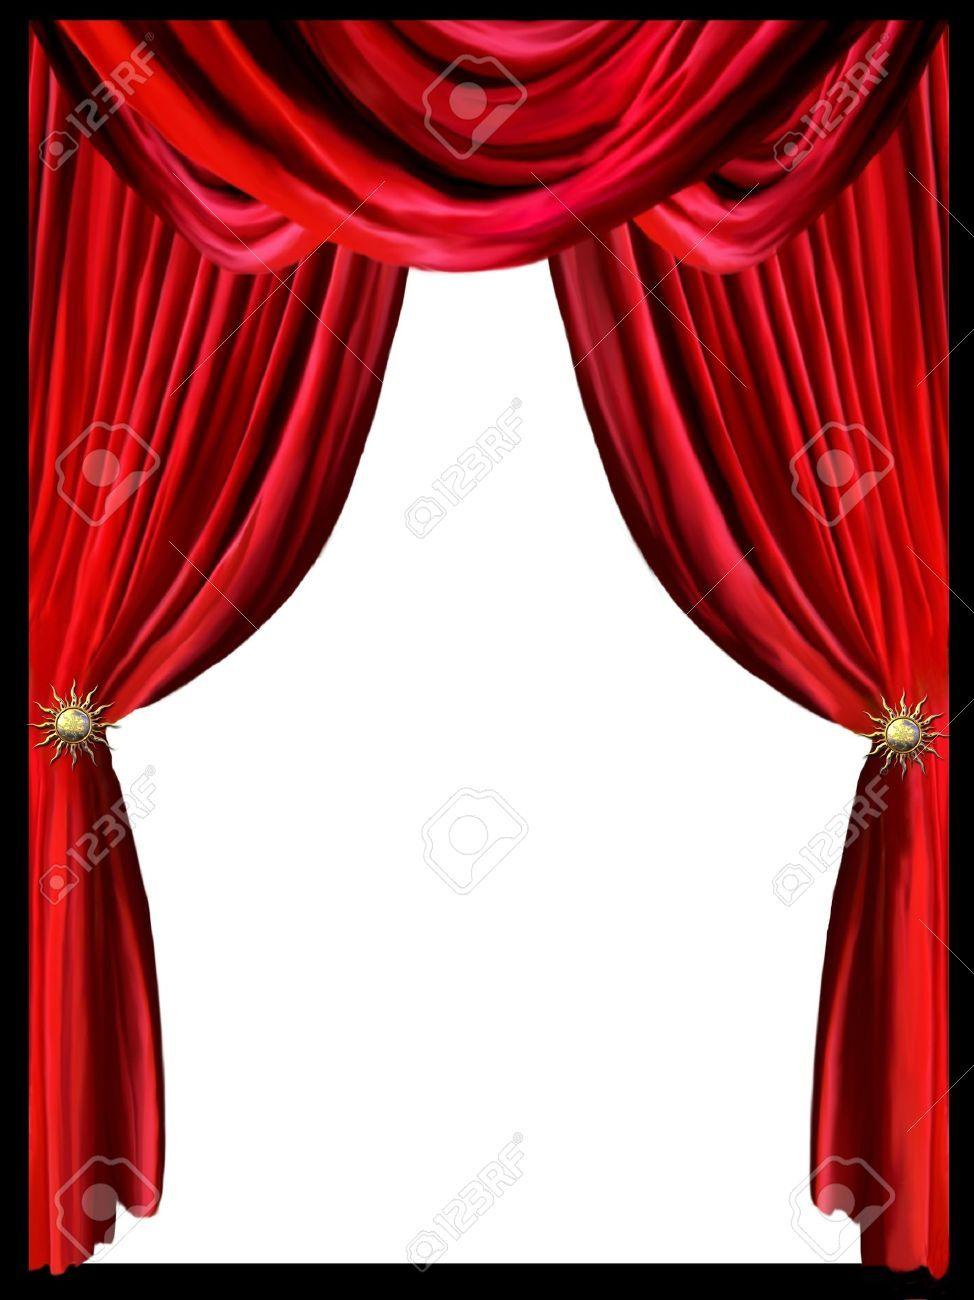 Shower Curtain Ribbon Border White Black Gray 72x72